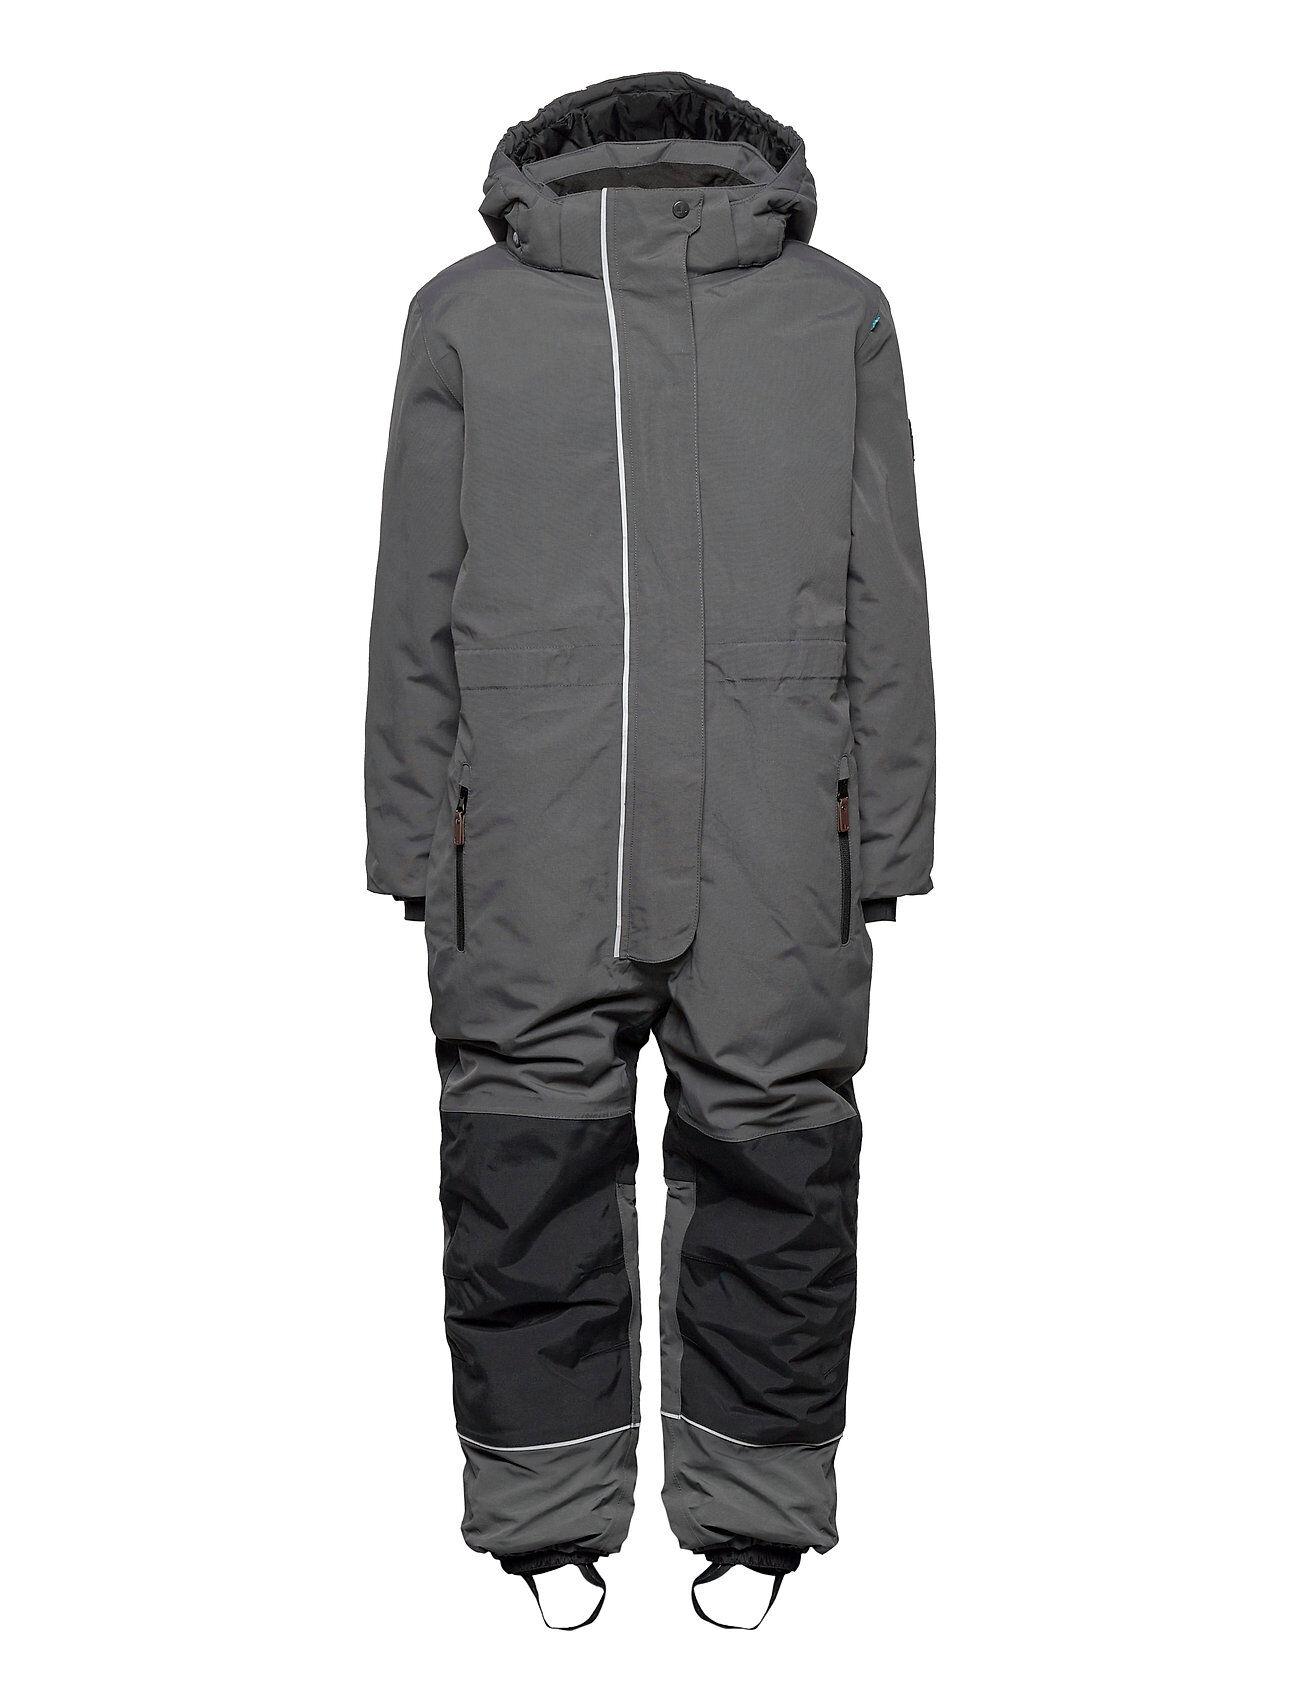 Lindberg Sweden Iceberg Overall Outerwear Snow/ski Clothing Snow/ski Suits & Sets Harmaa Lindberg Sweden